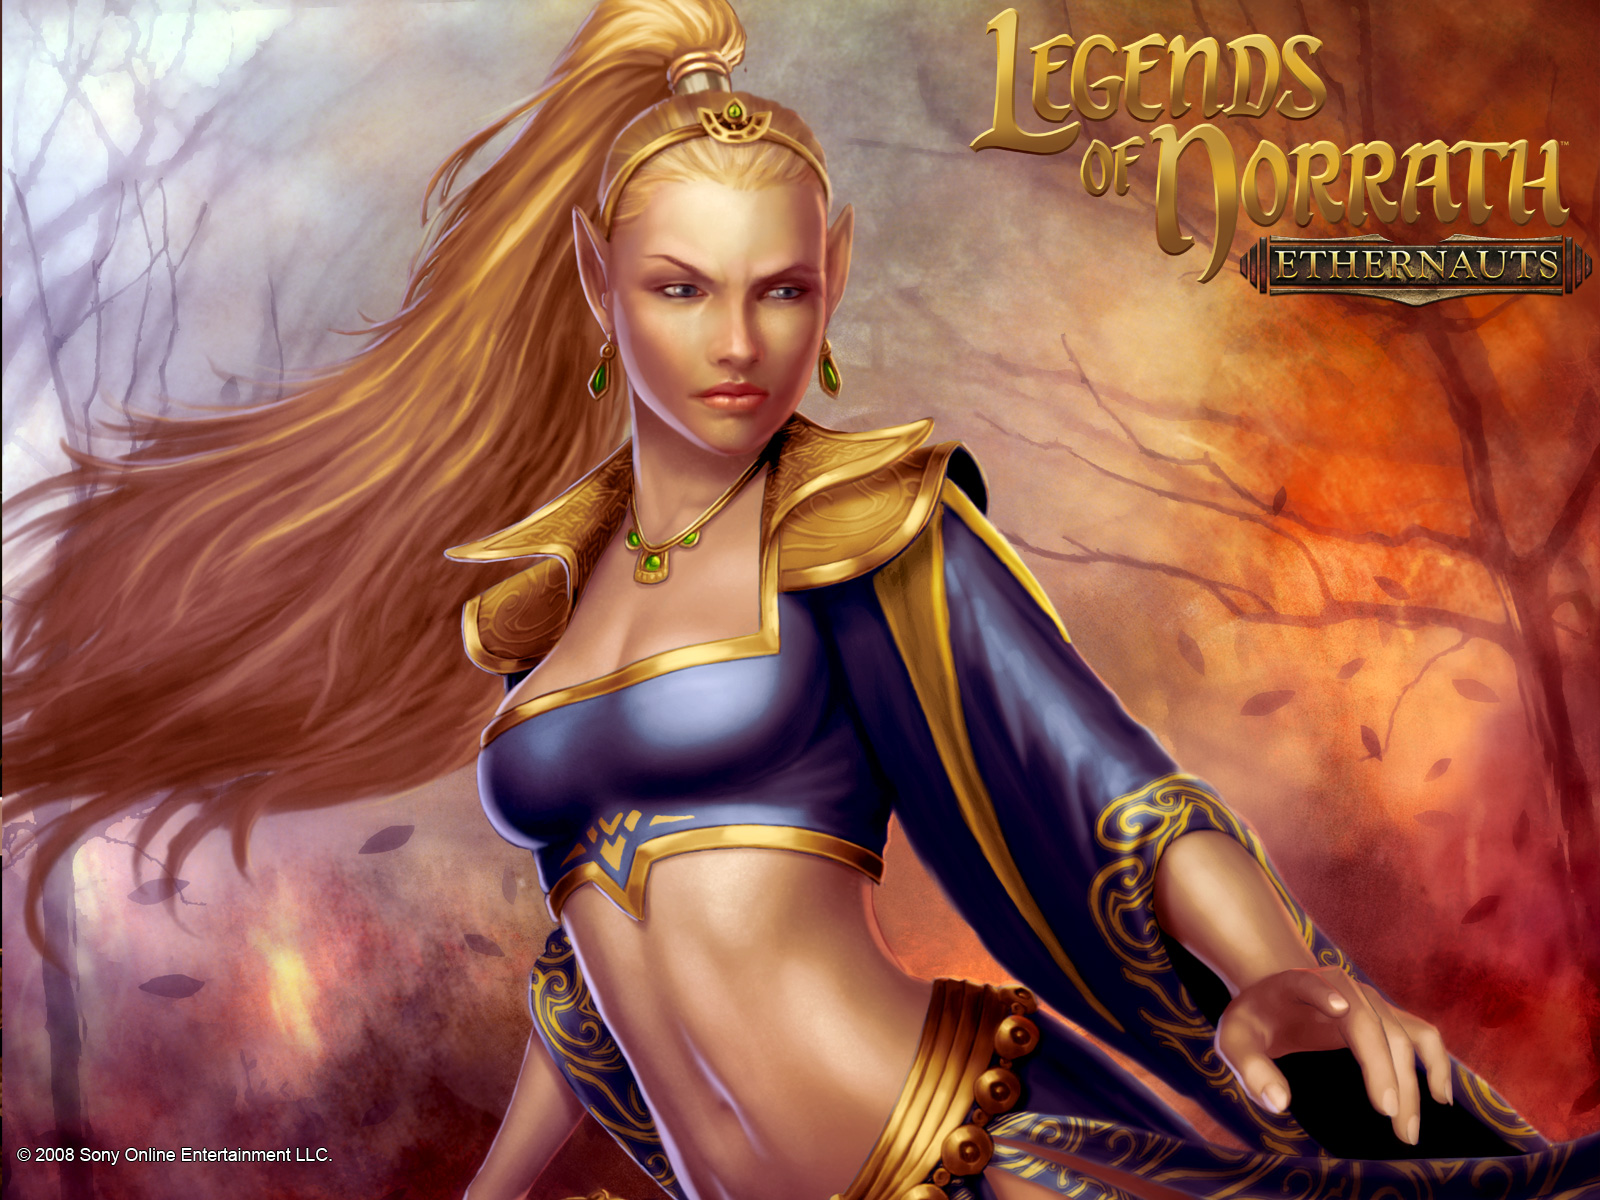 Legends Of Norrath Backgrounds, Compatible - PC, Mobile, Gadgets| 1600x1200 px